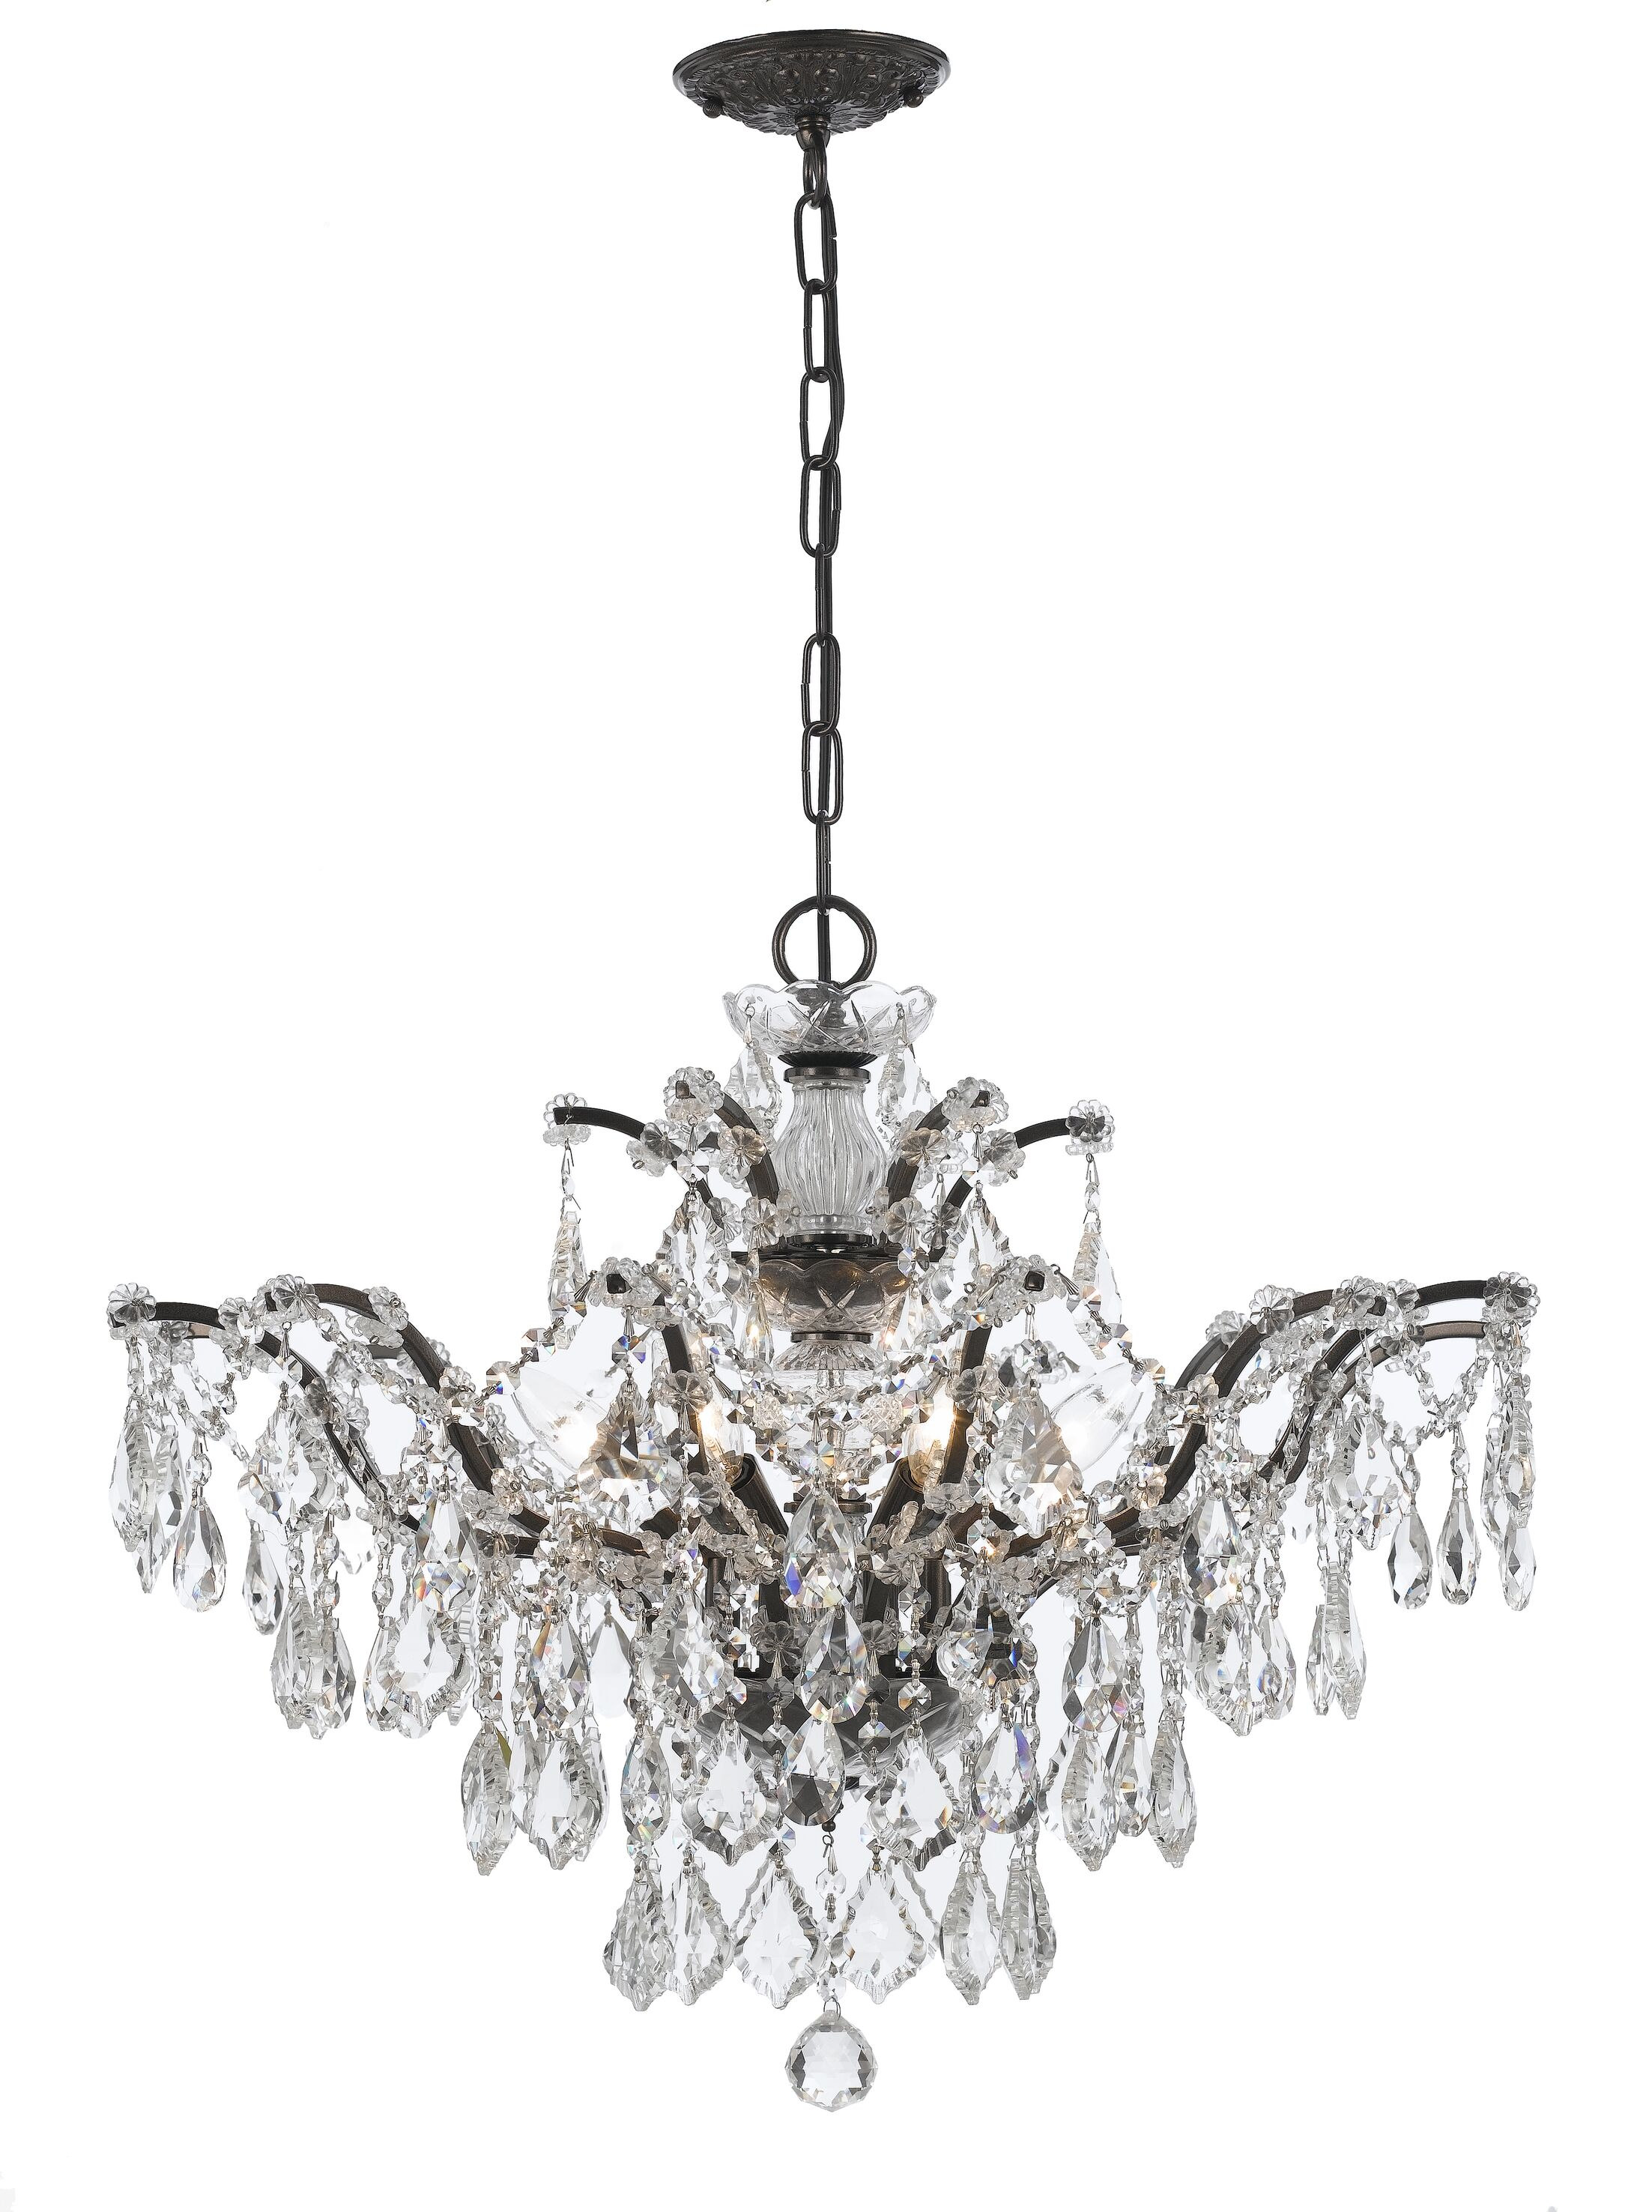 Maira 6-Light Candle Style Chandelier Finish: Vibrant Bronze, Crystal Grade: Swarovski Elements